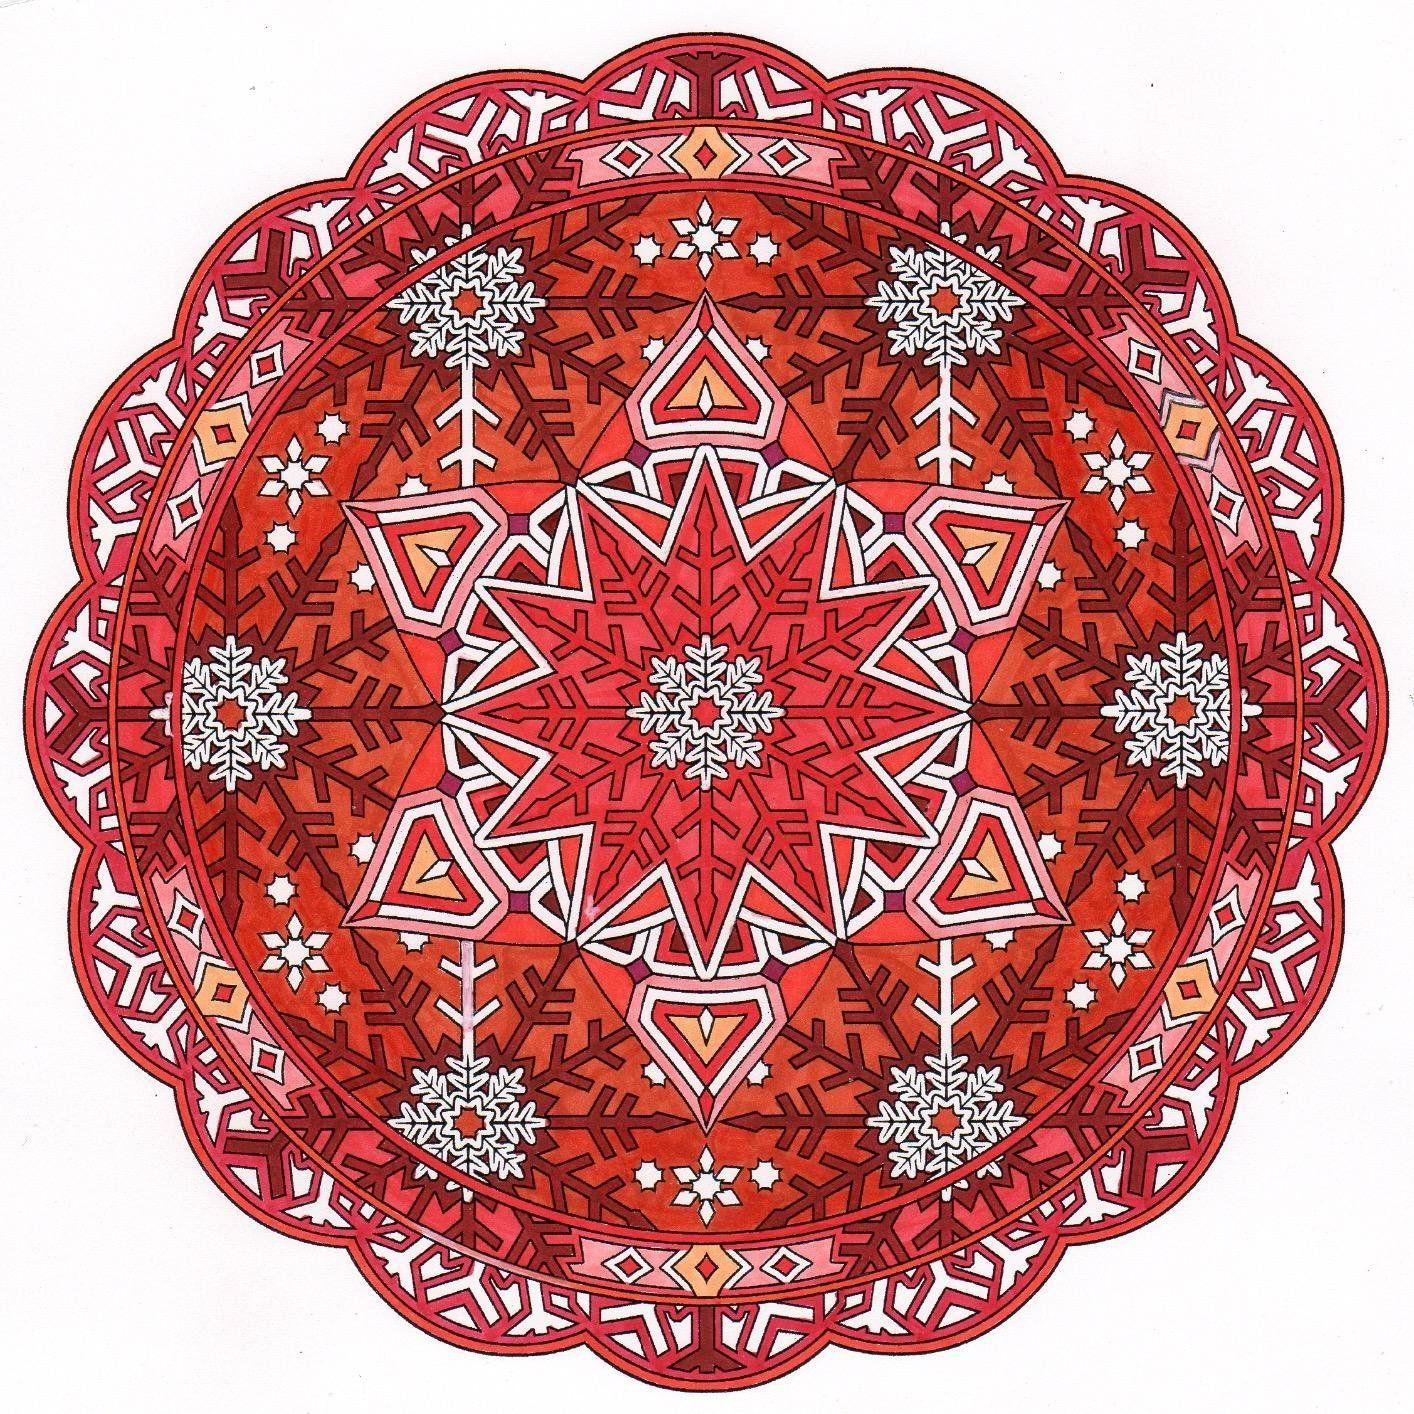 Creative Haven Snowflake Mandalas Coloring Book Adult Marty Noble 9780486803760